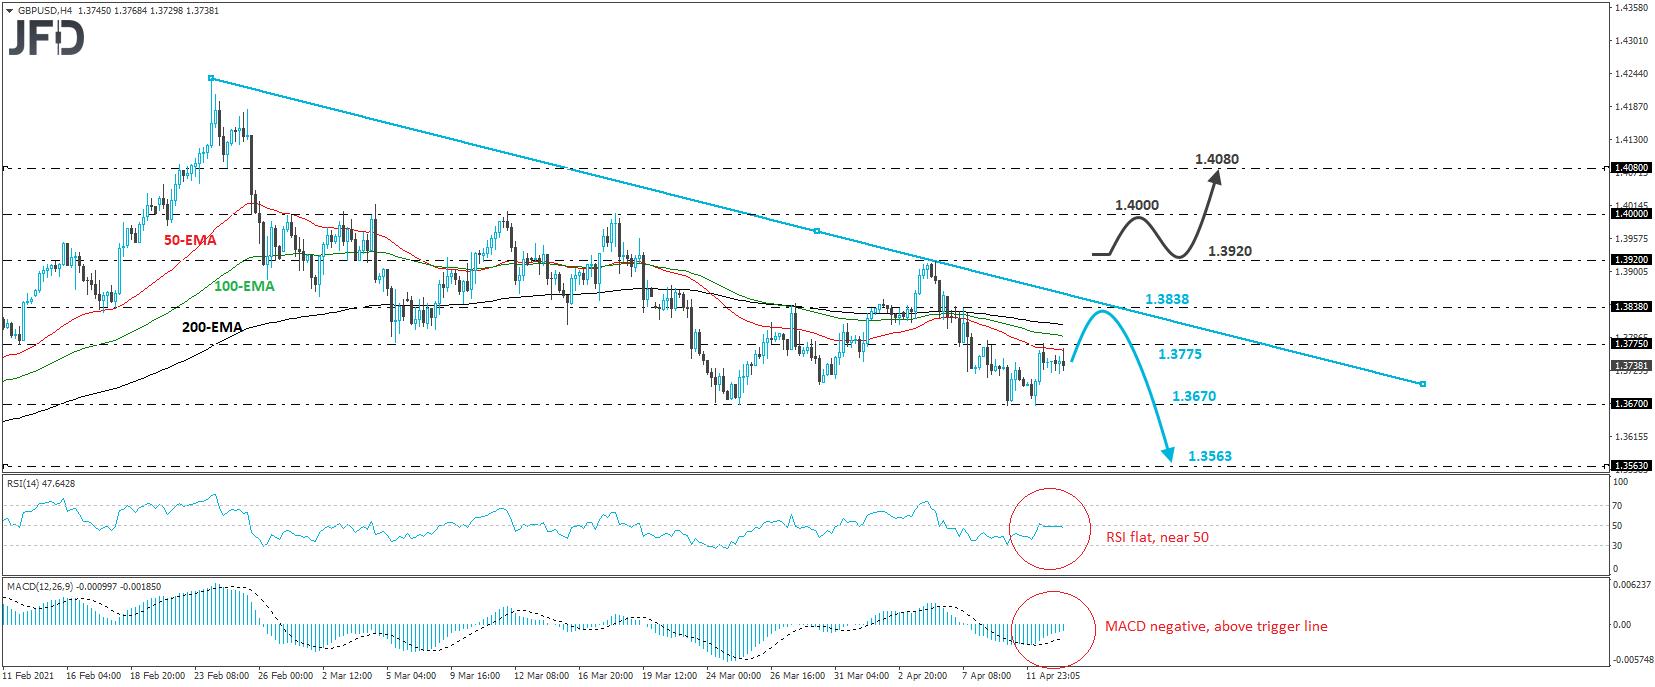 GBP/USD 4-hour chart technical analysis